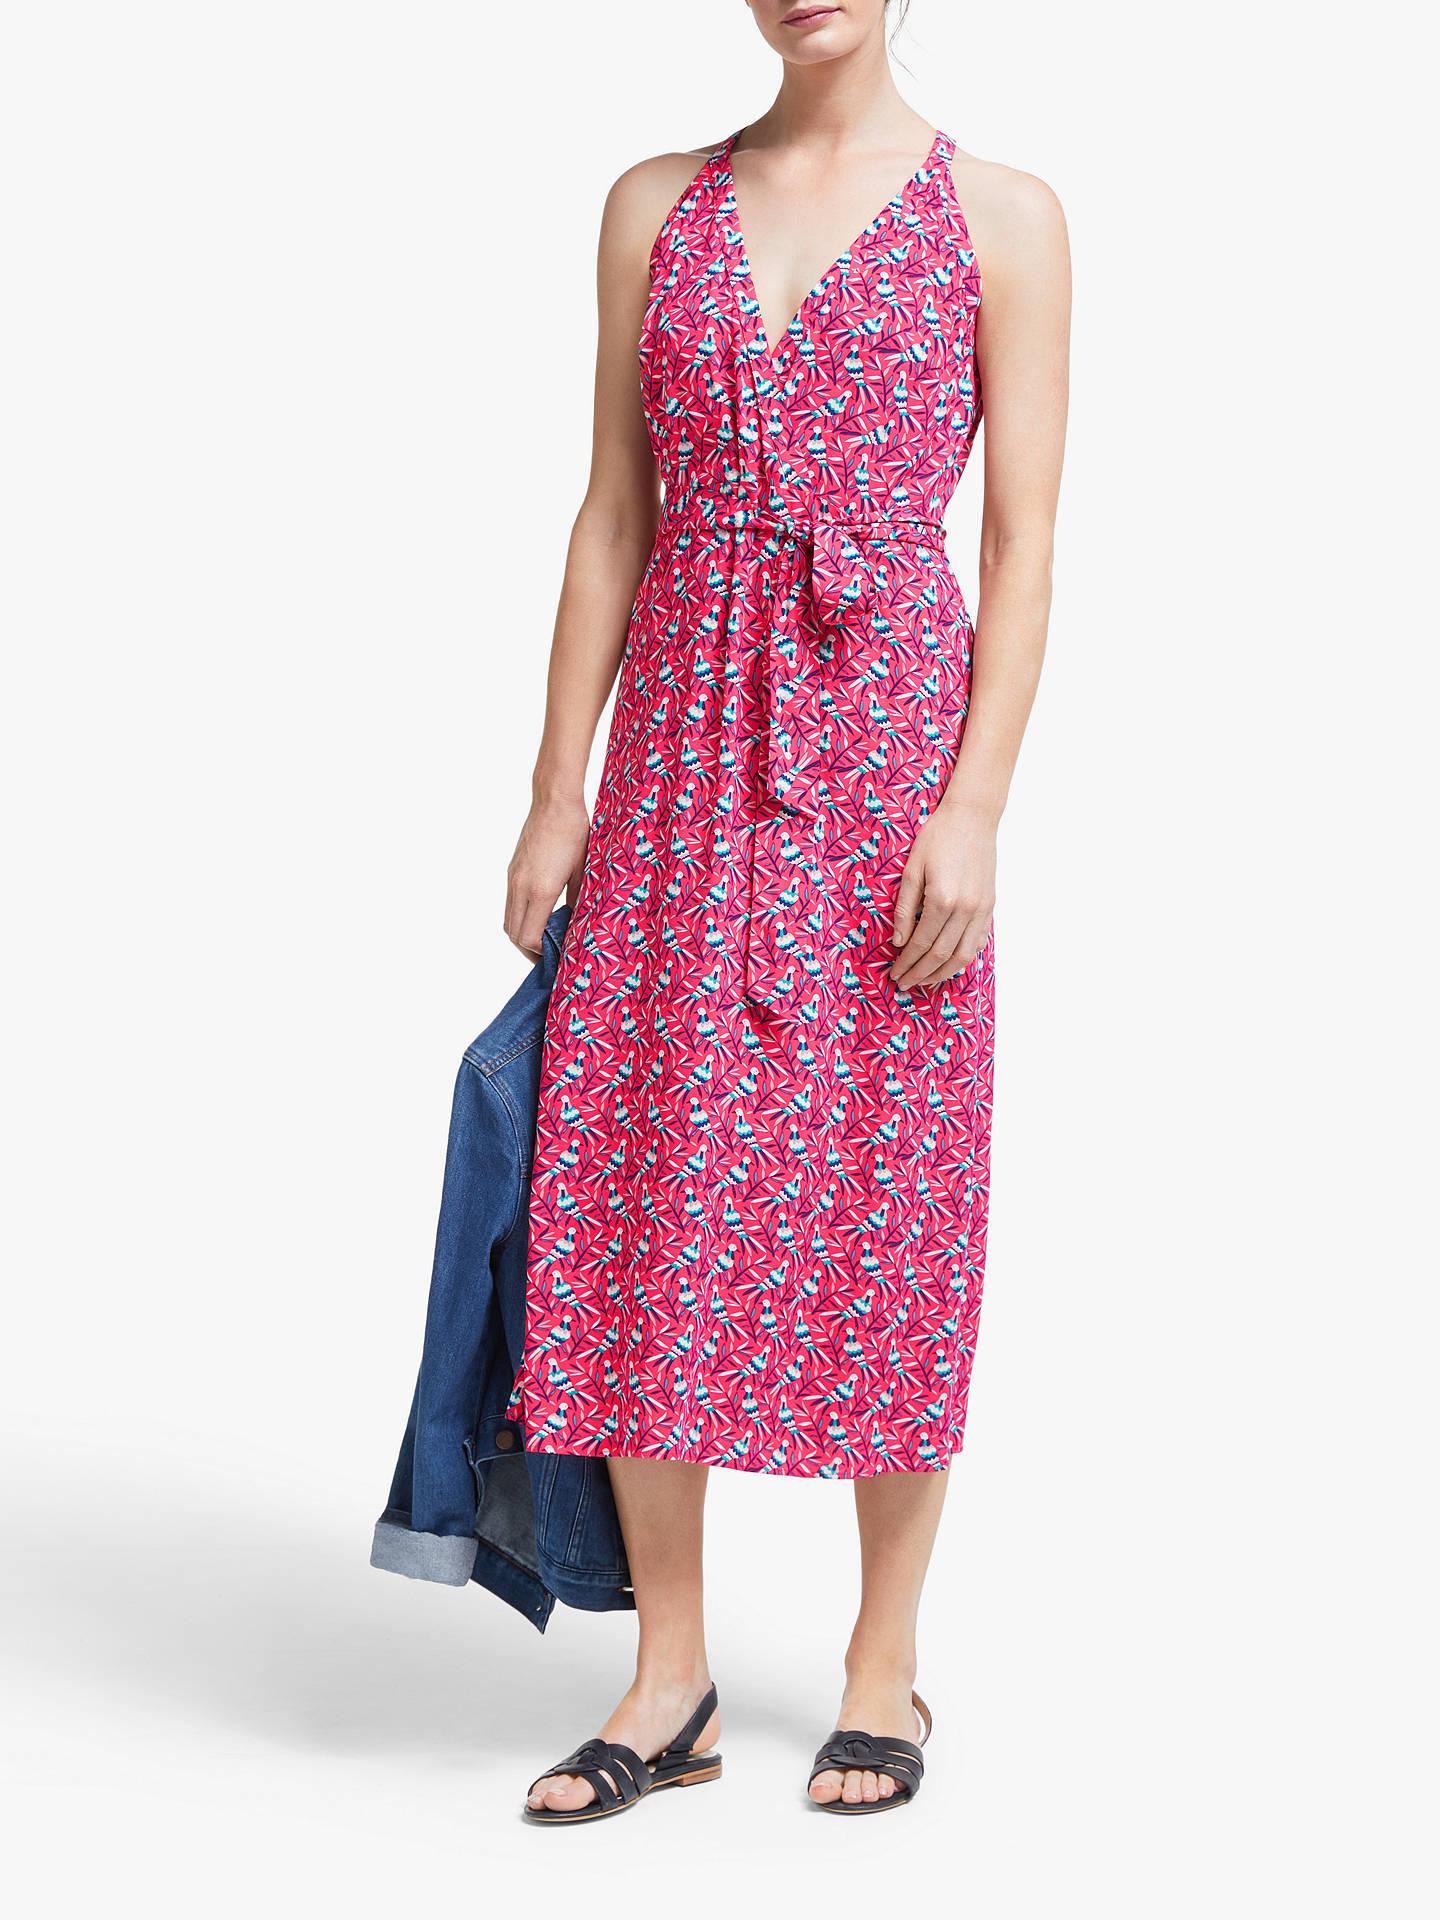 79b61f1f4ed7 Buy Boden Olwen Dress, Strawberry Split, 8 Online at johnlewis.com ...